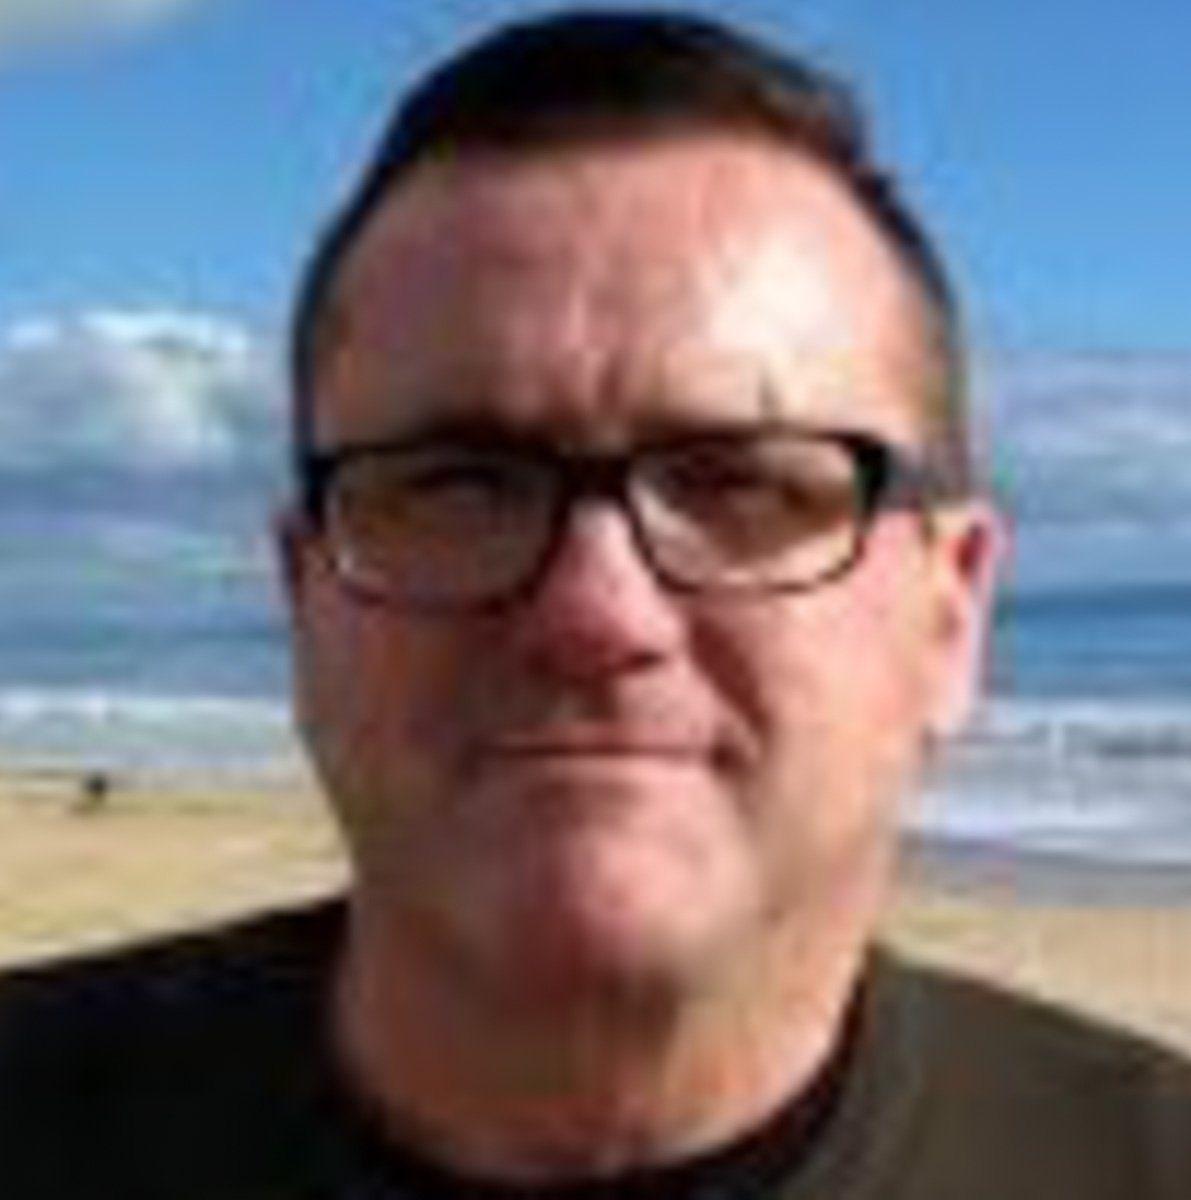 Steve O'Donoghue